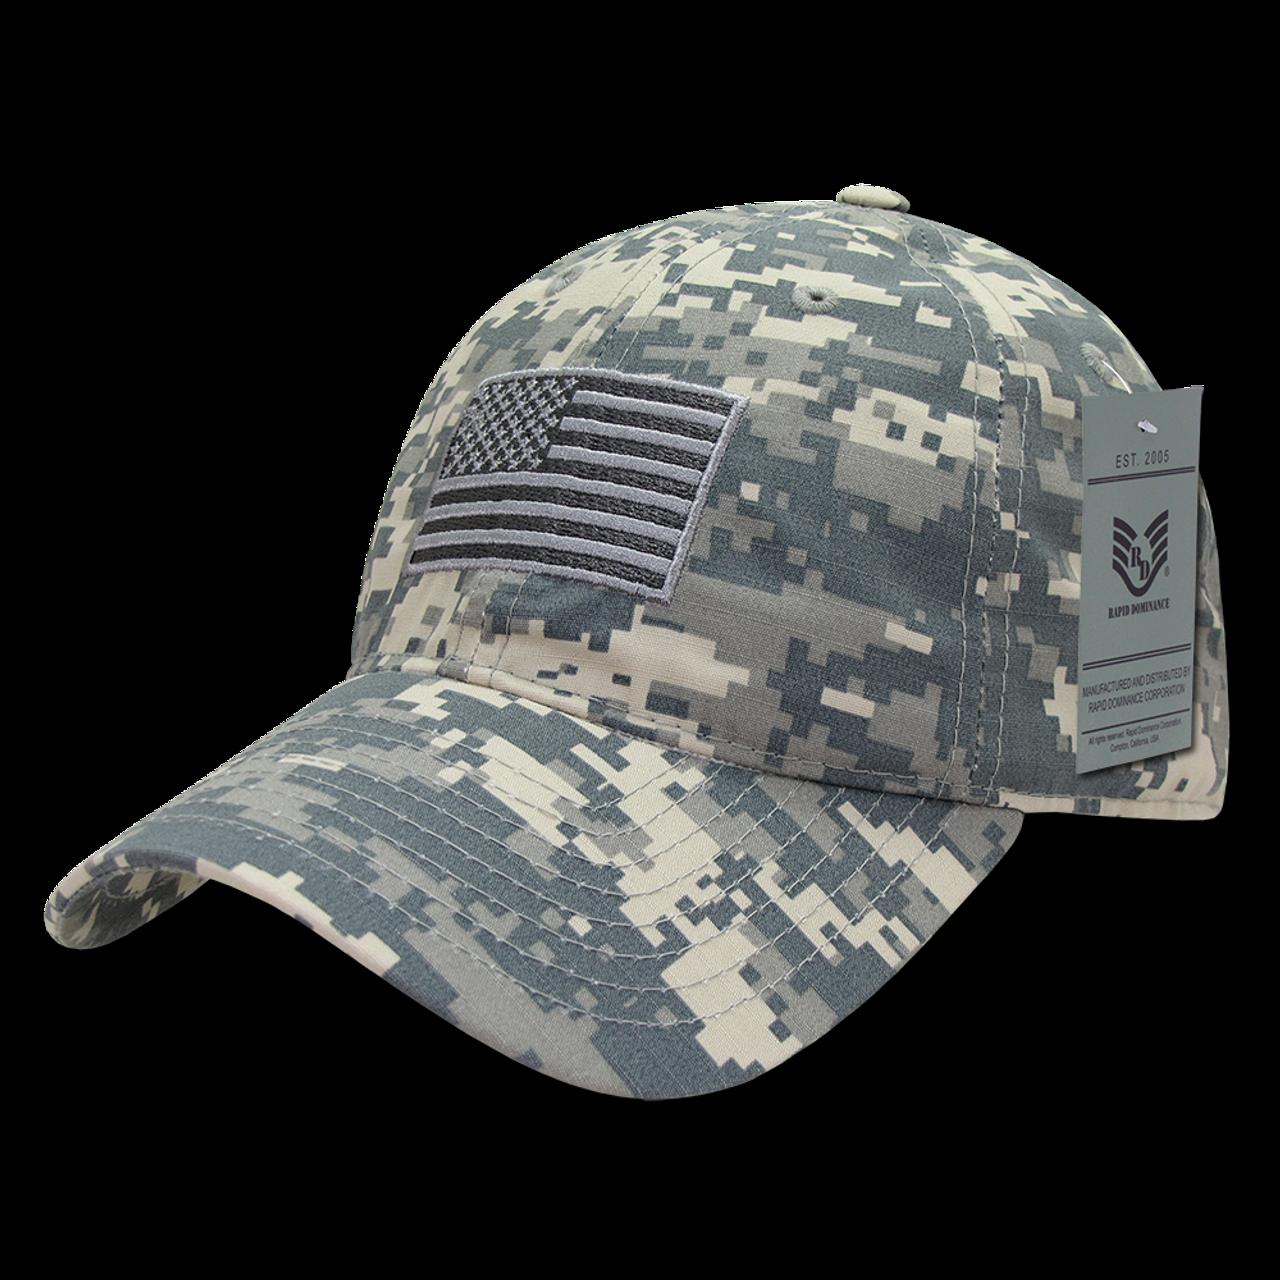 4acf57ecaf9 S73 - USA Flag Cap - Relaxed Ripstop - Cotton - ACU Digital Camouflage -  USMILITARYHATS.COM